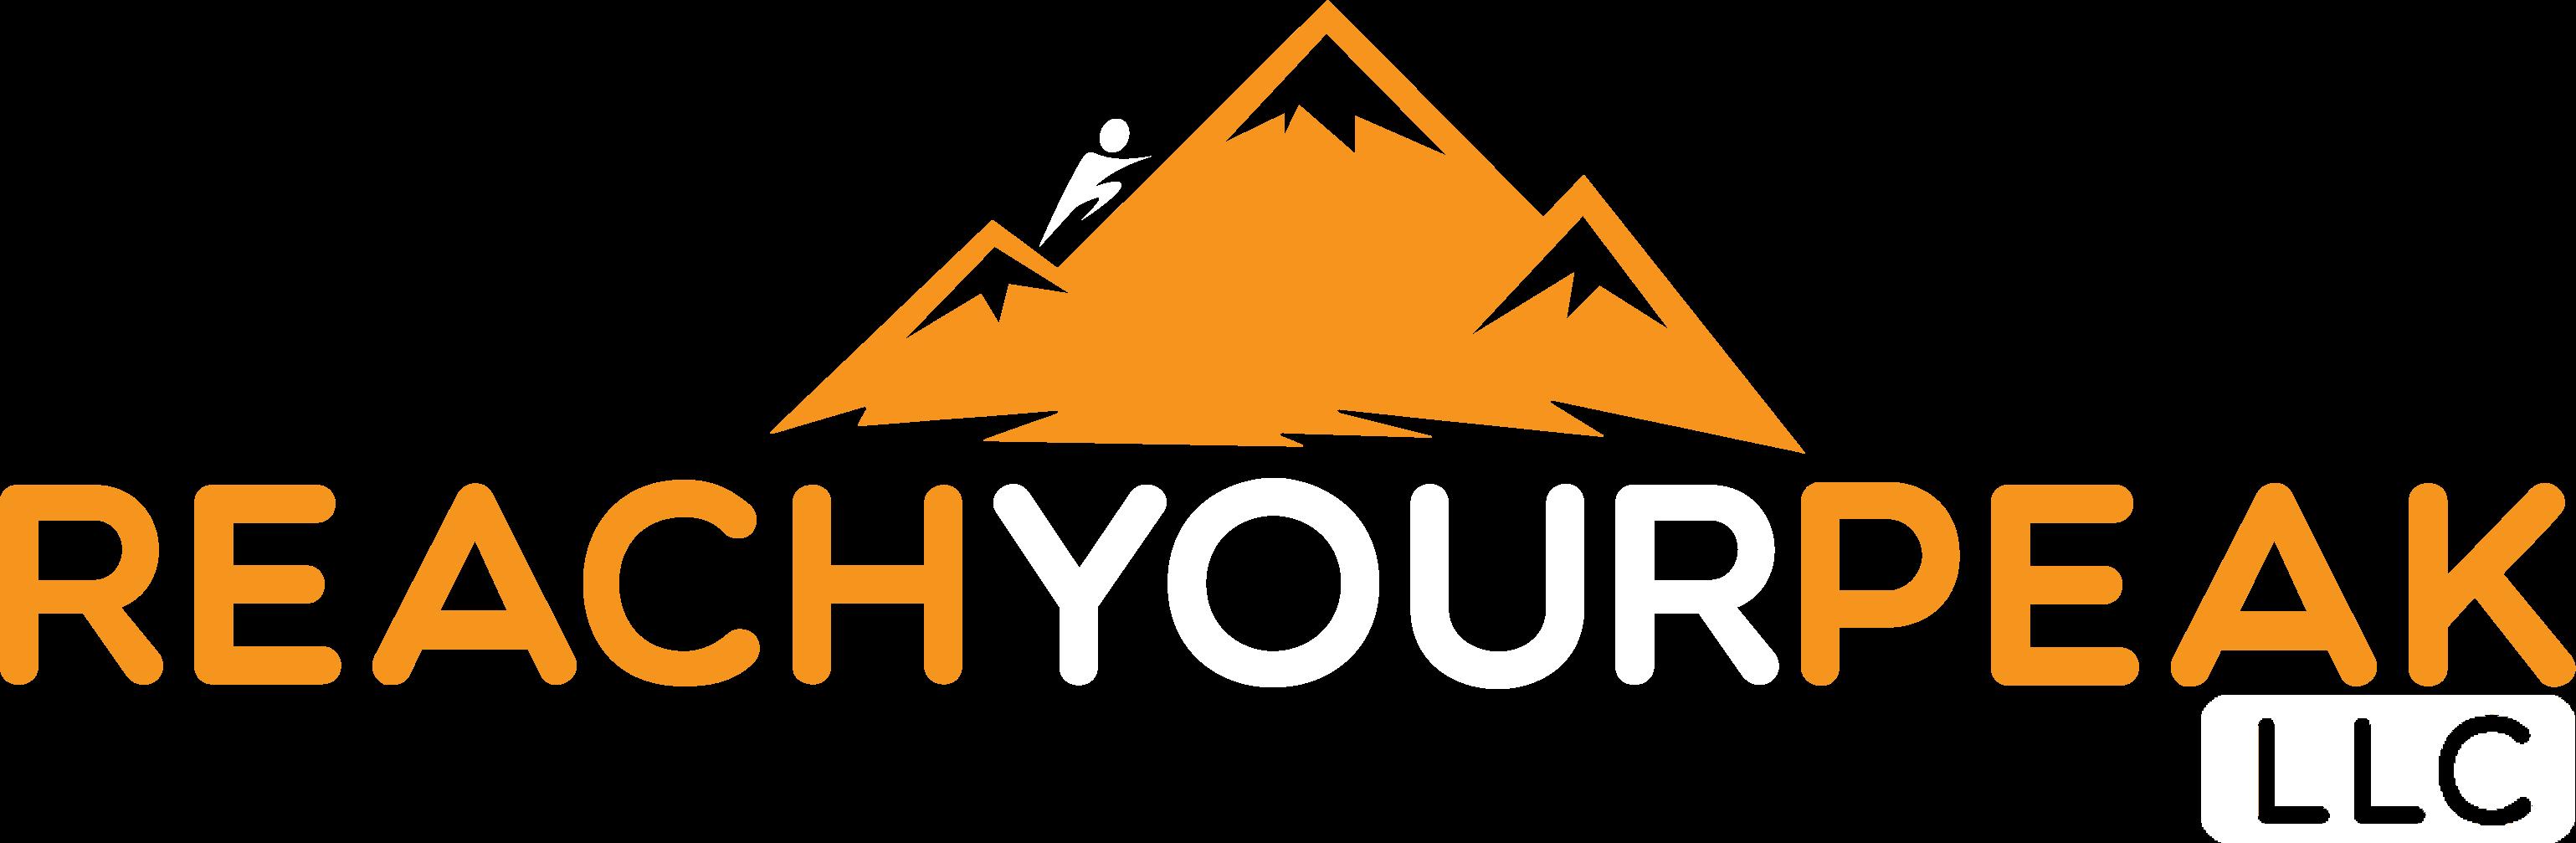 Reach Your Peak LLC